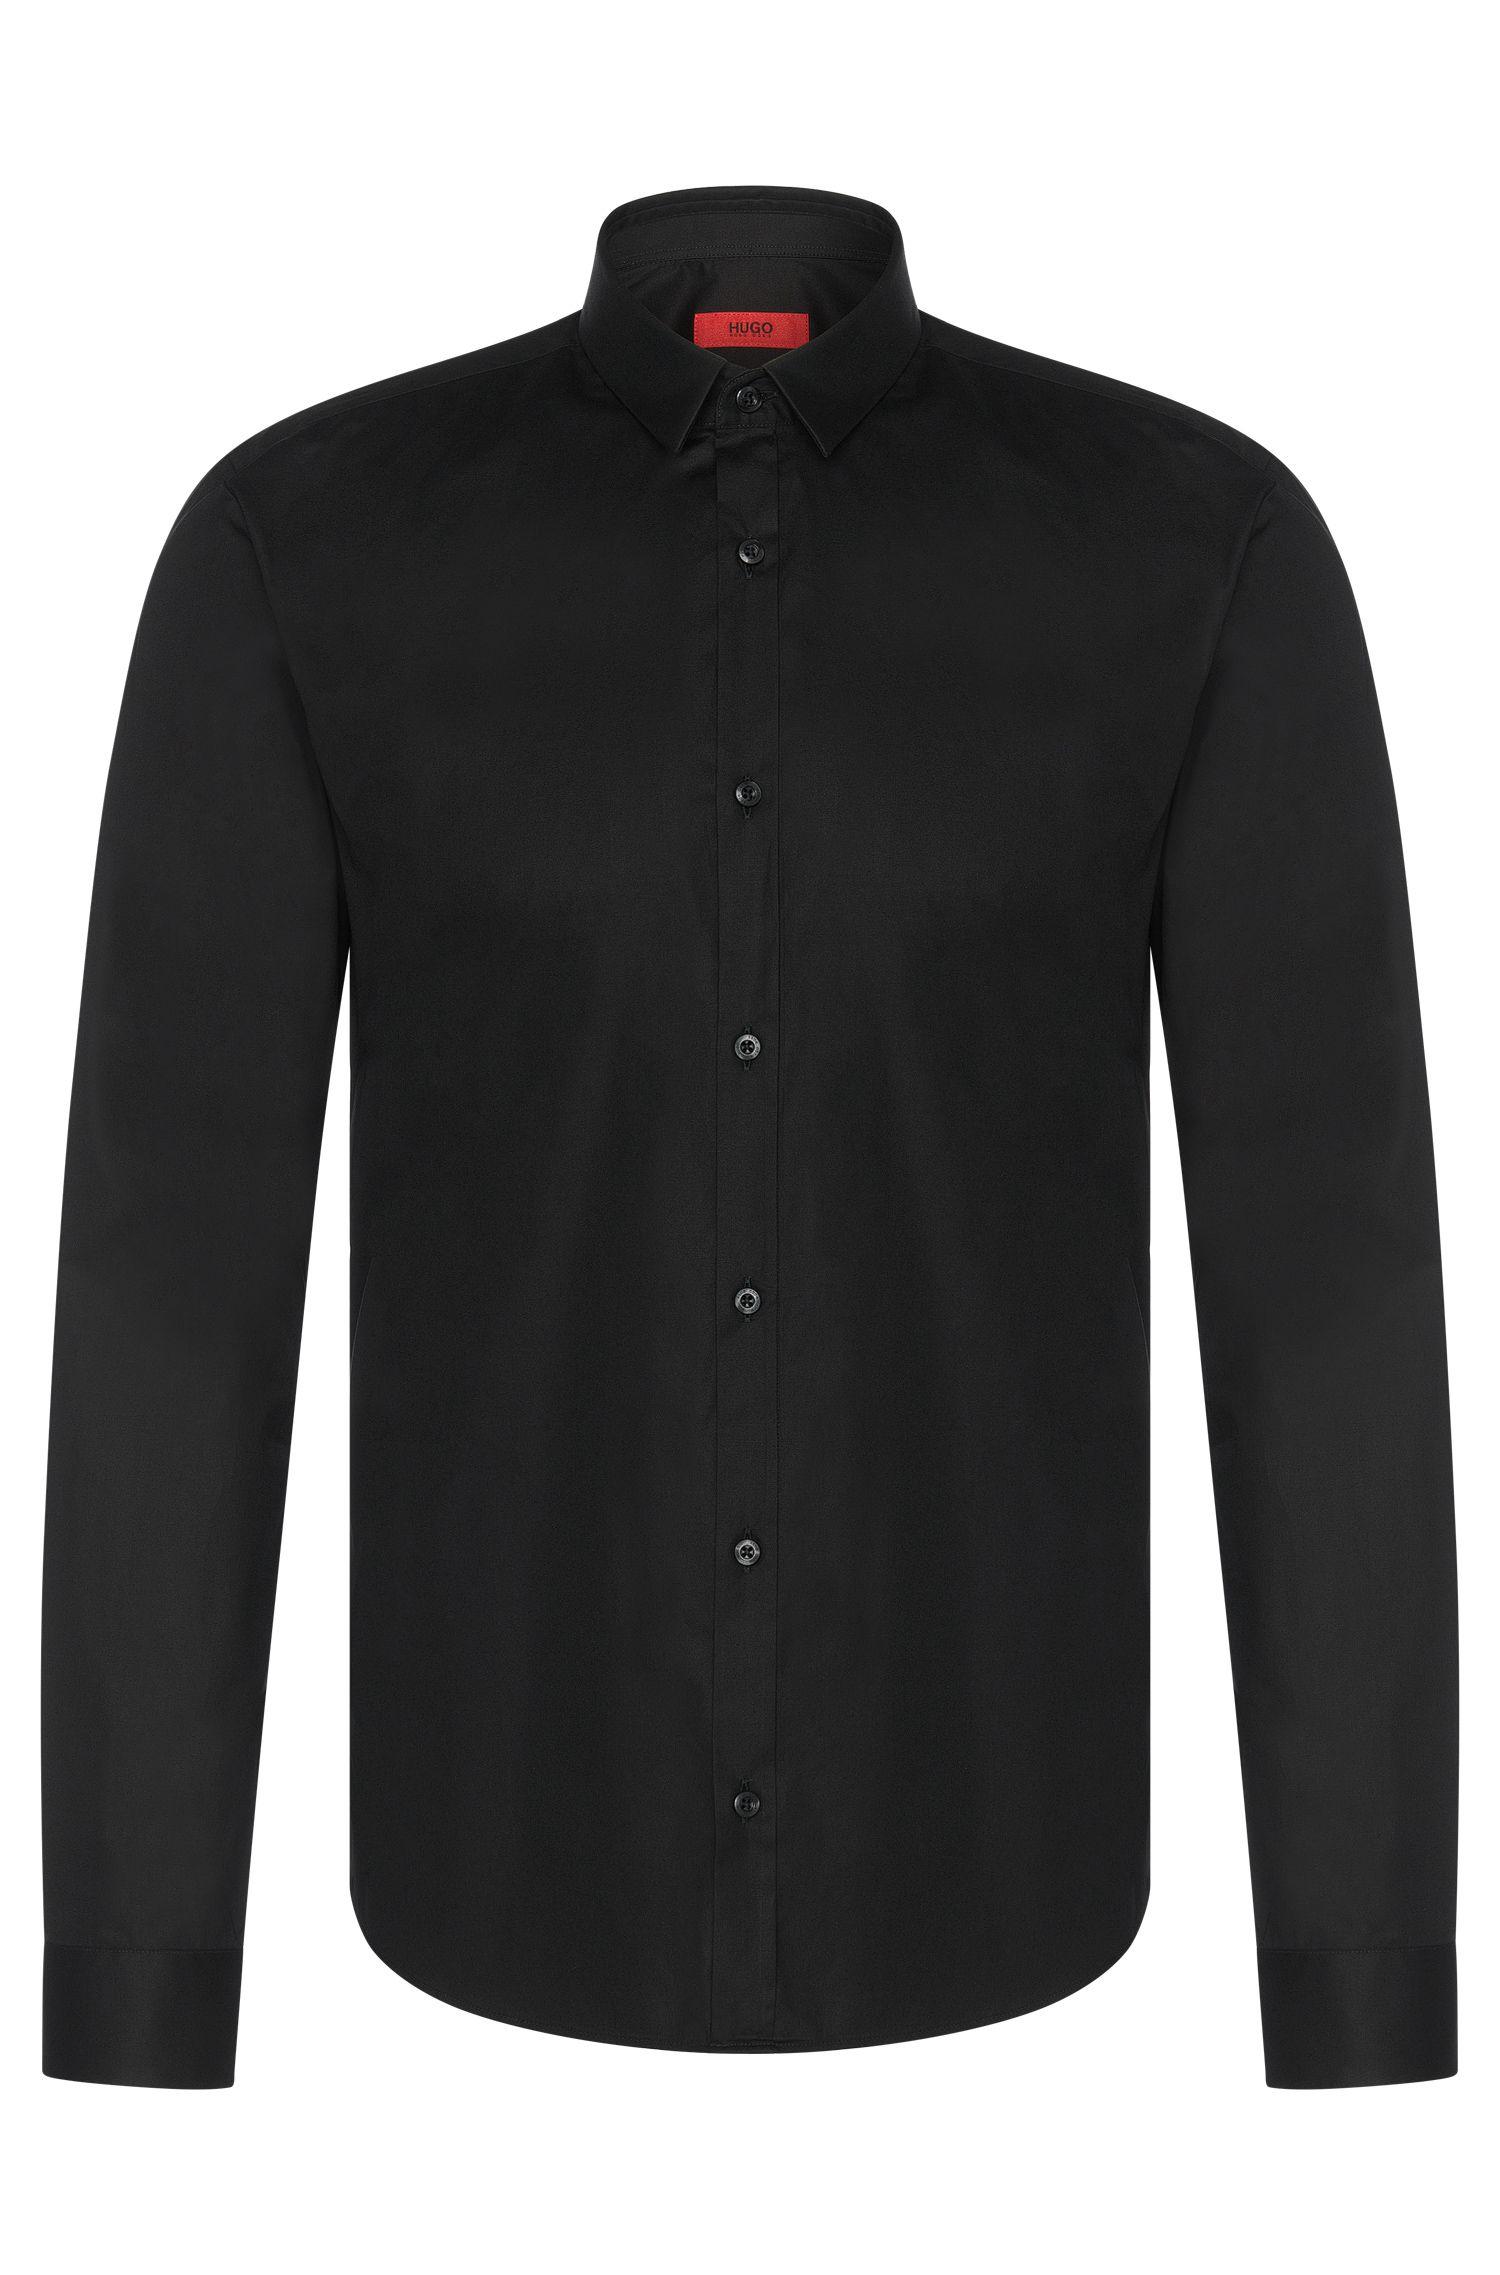 'Ero' | Slim Fit, Stretch Cotton Button Down Shirt